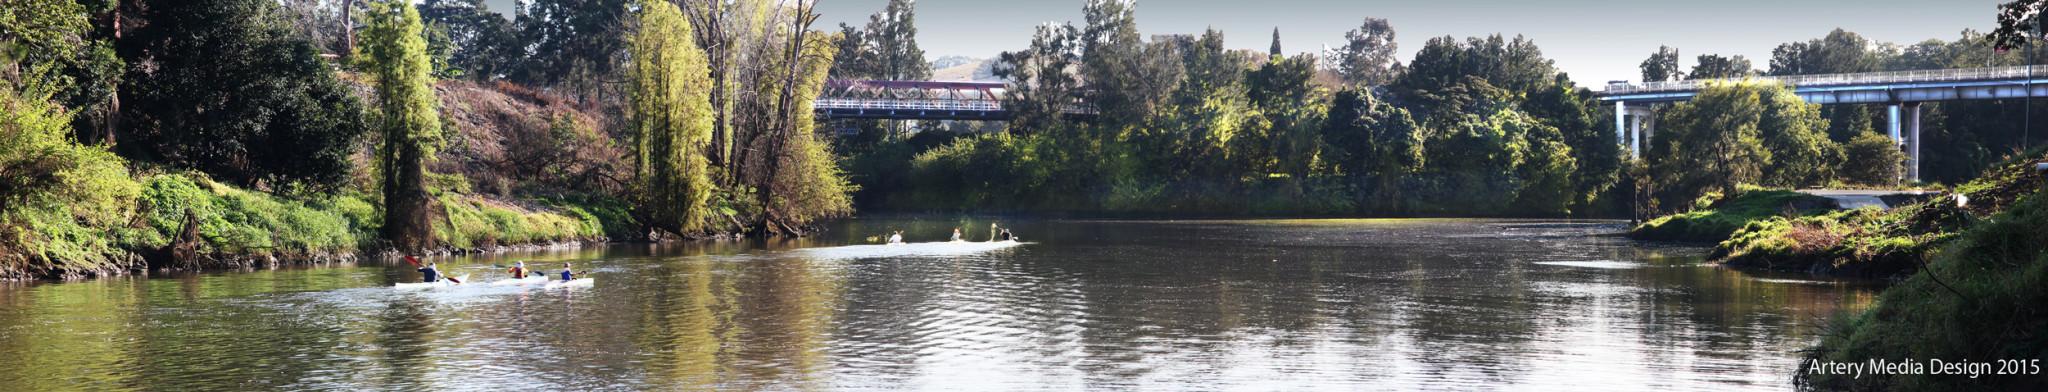 Panorama of Wilsons River in Lismore